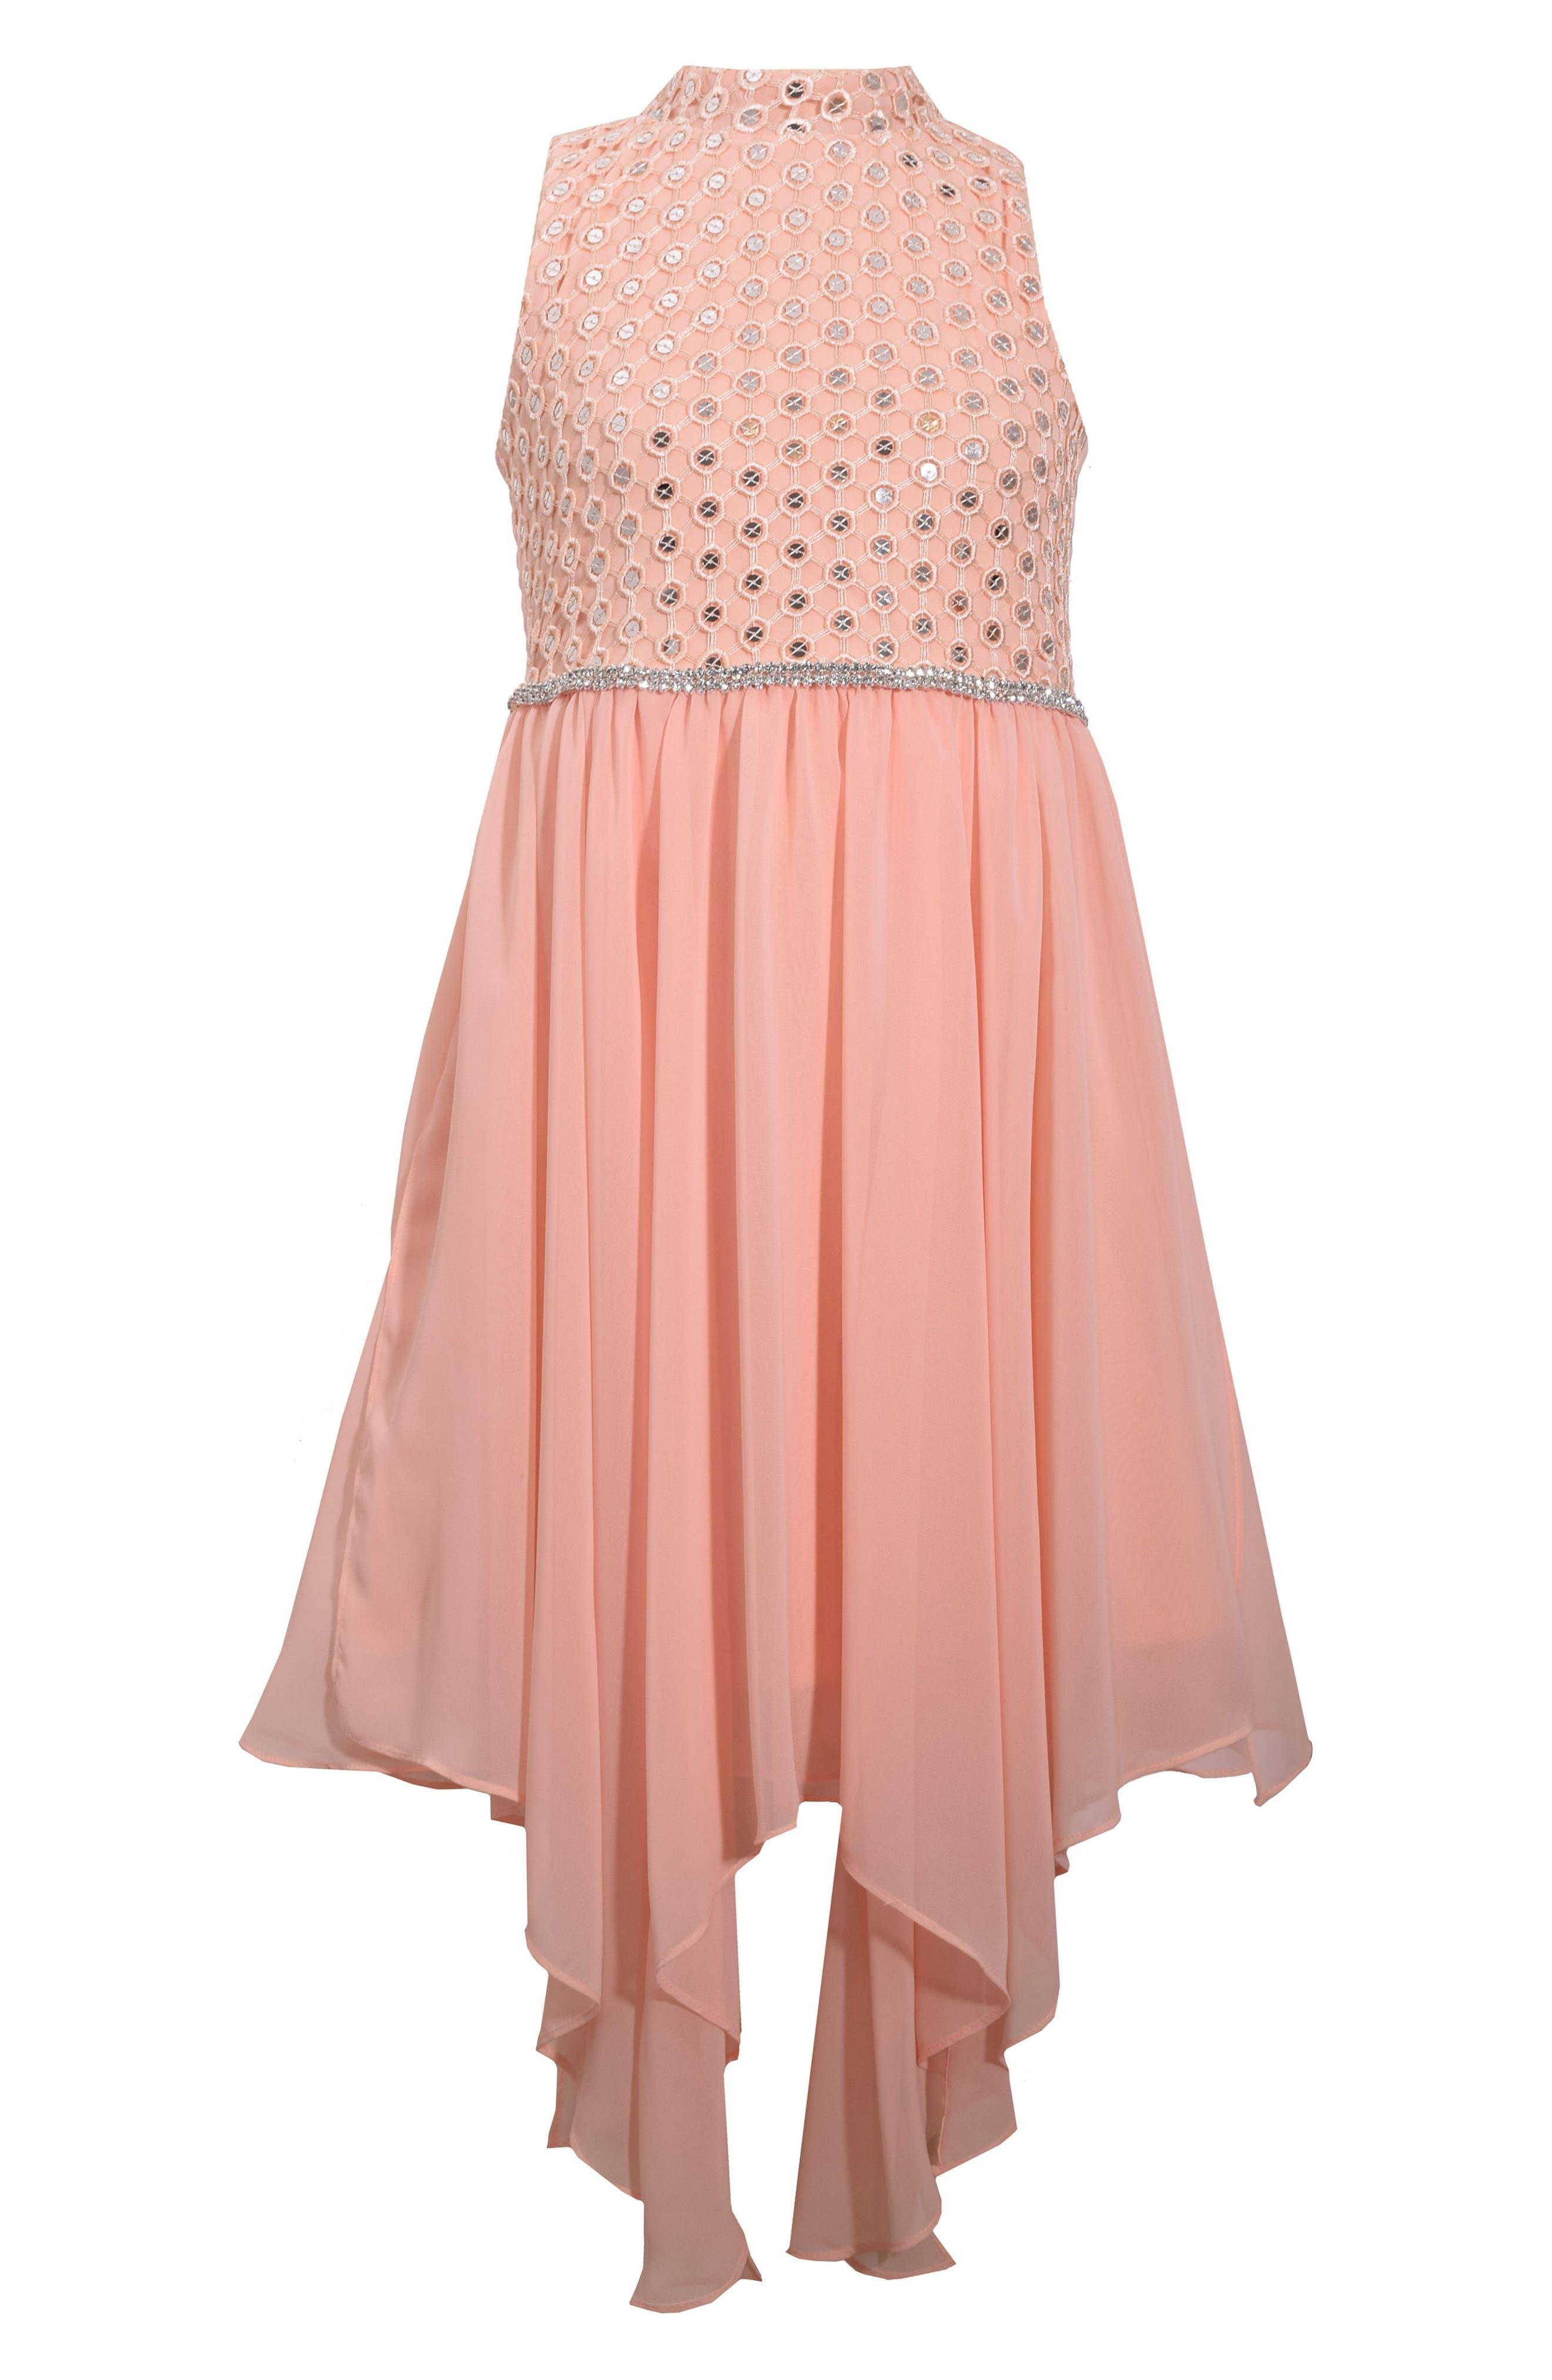 Gerson & Gerson Sequin Handkerchief Hem Dress,                         Main,                         color, Peach